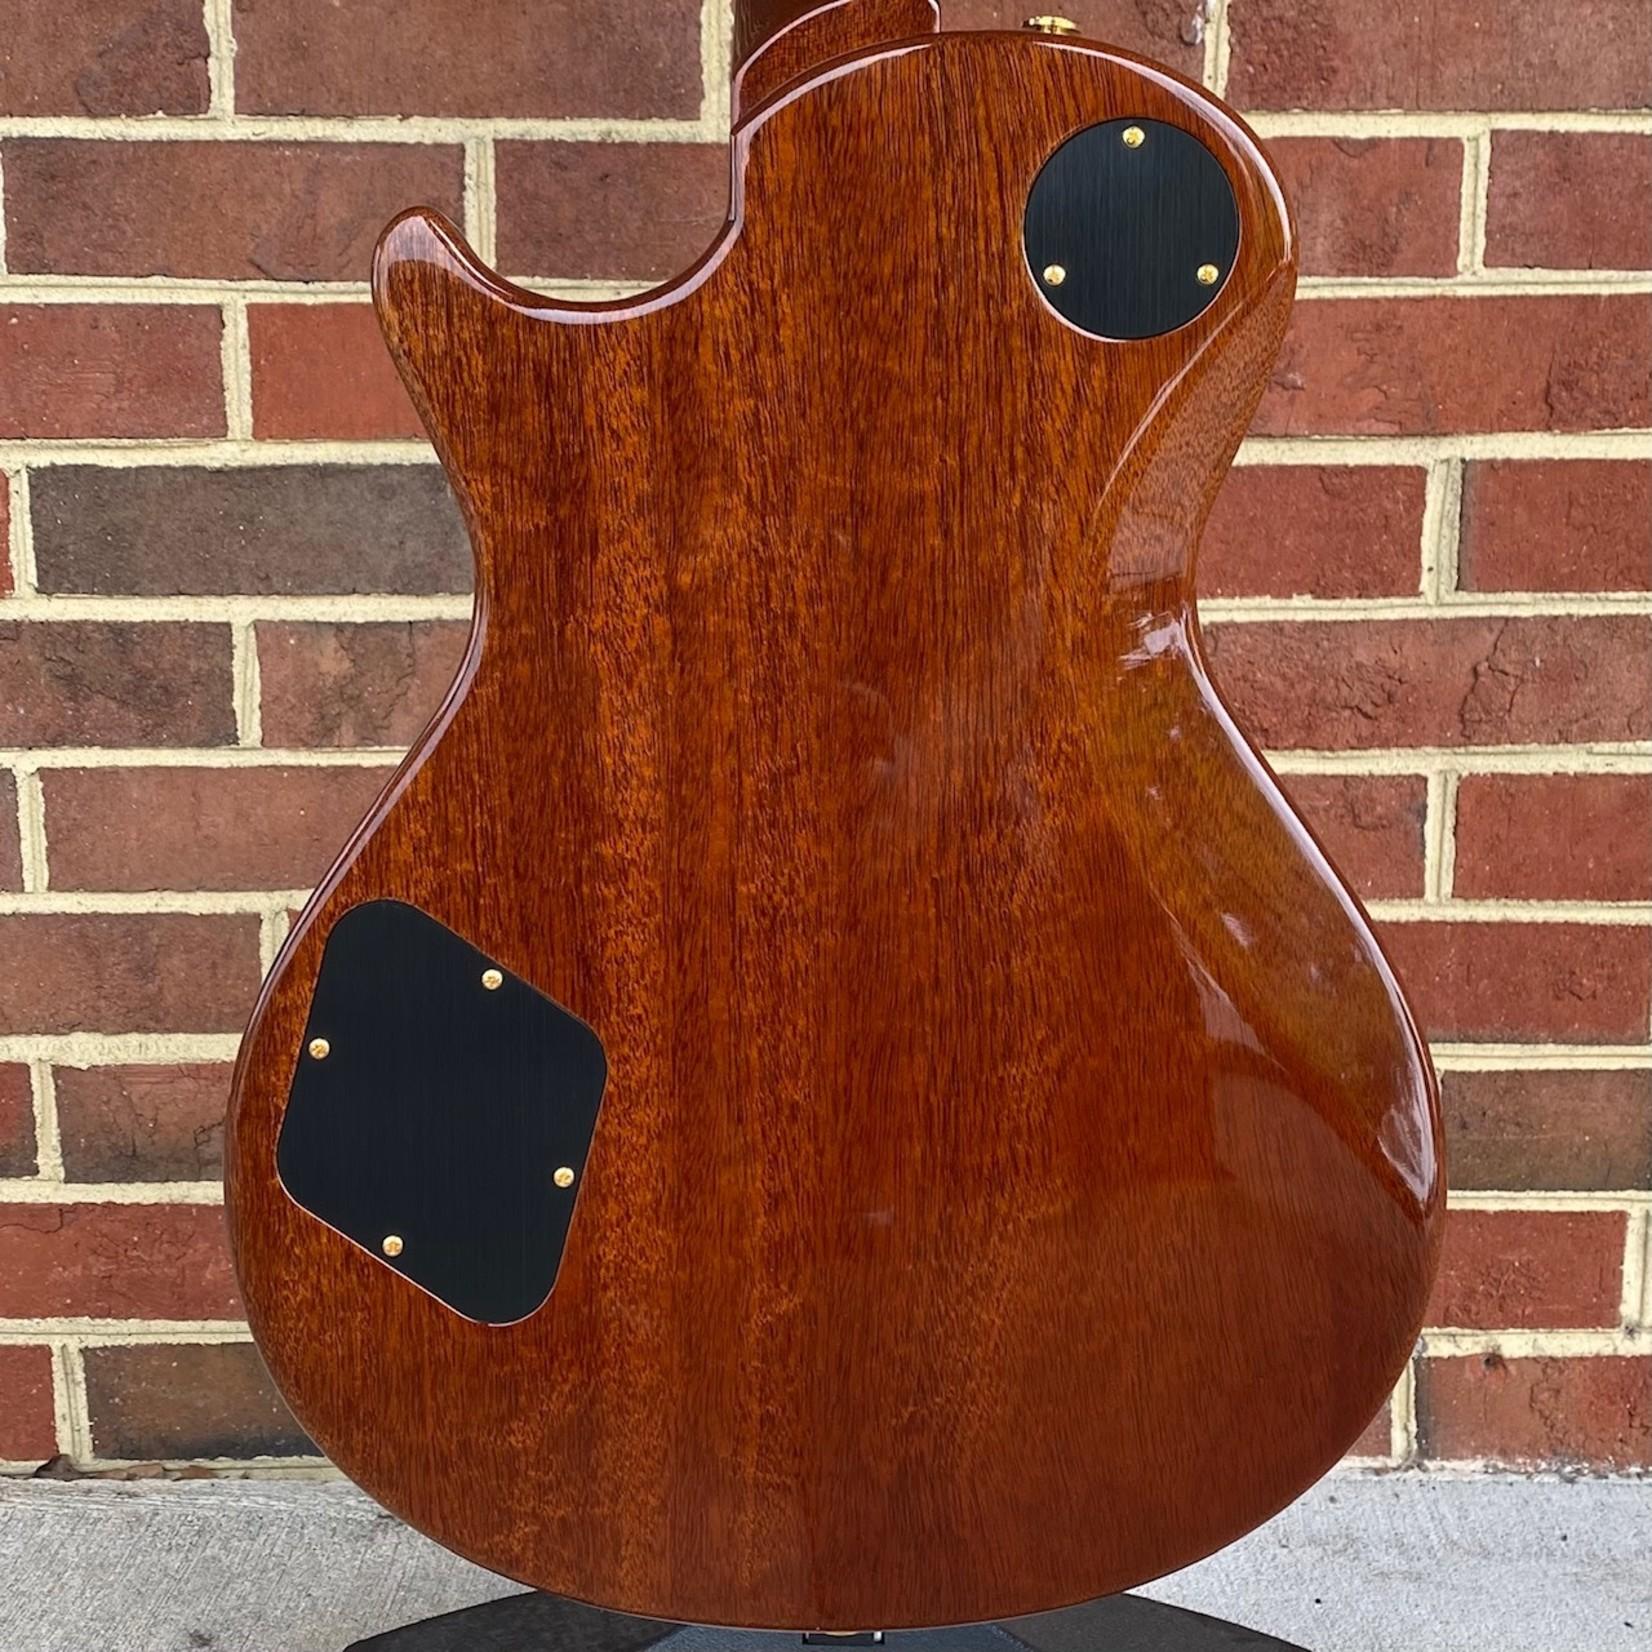 Paul Reed Smith Paul Reed Smith McCarty 594 Singlecut, 10 Top, Orange Tiger, Hybrid Hardware, 58/15 LT+ TCI Pickups, Pattern Vintage Neck, Hardshell Case